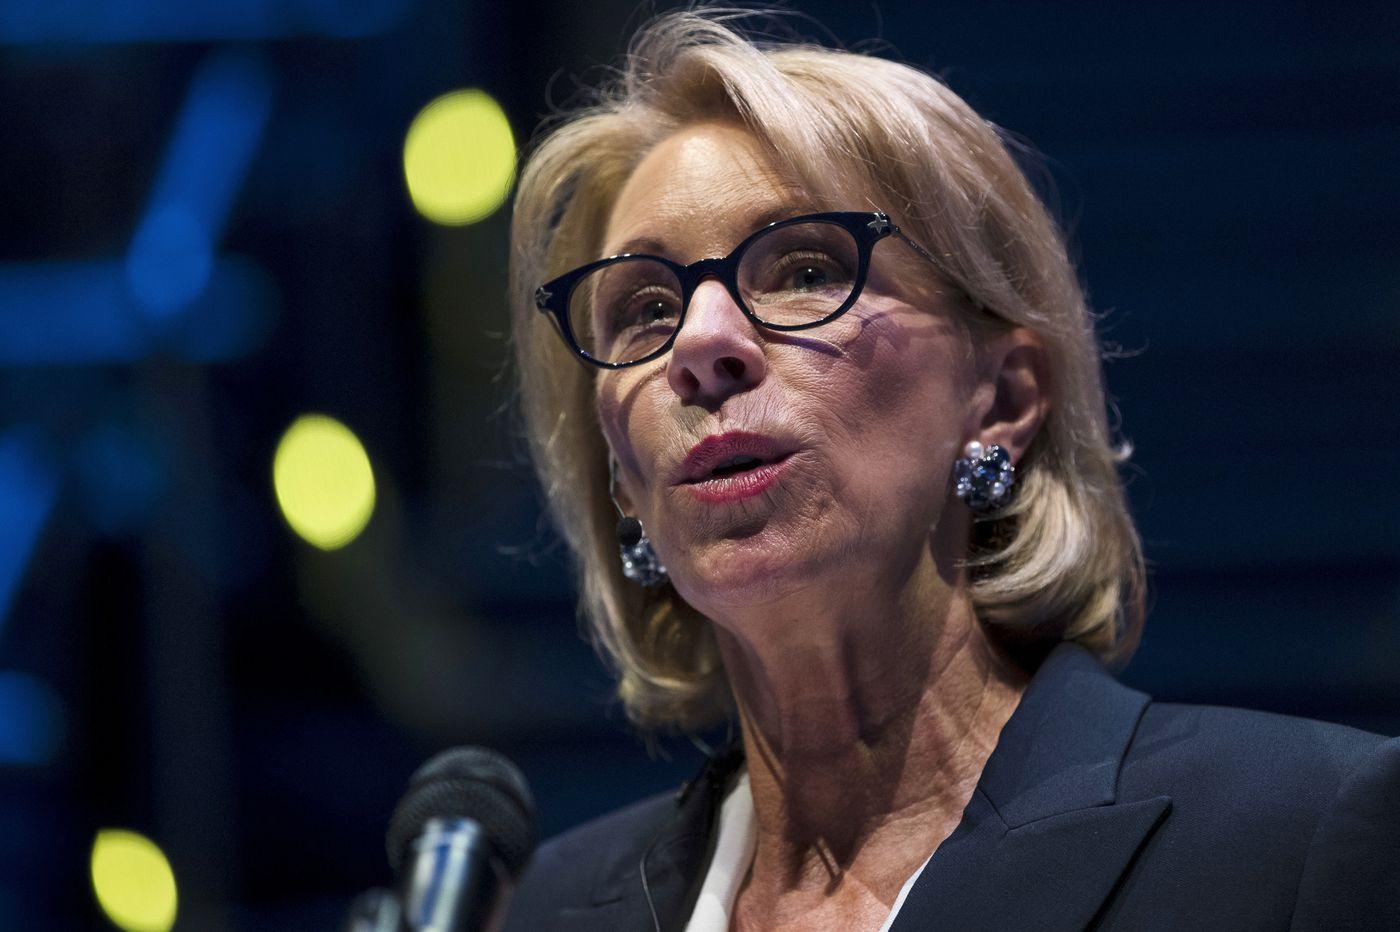 Trump's safety panel seeks to revoke school discipline rules